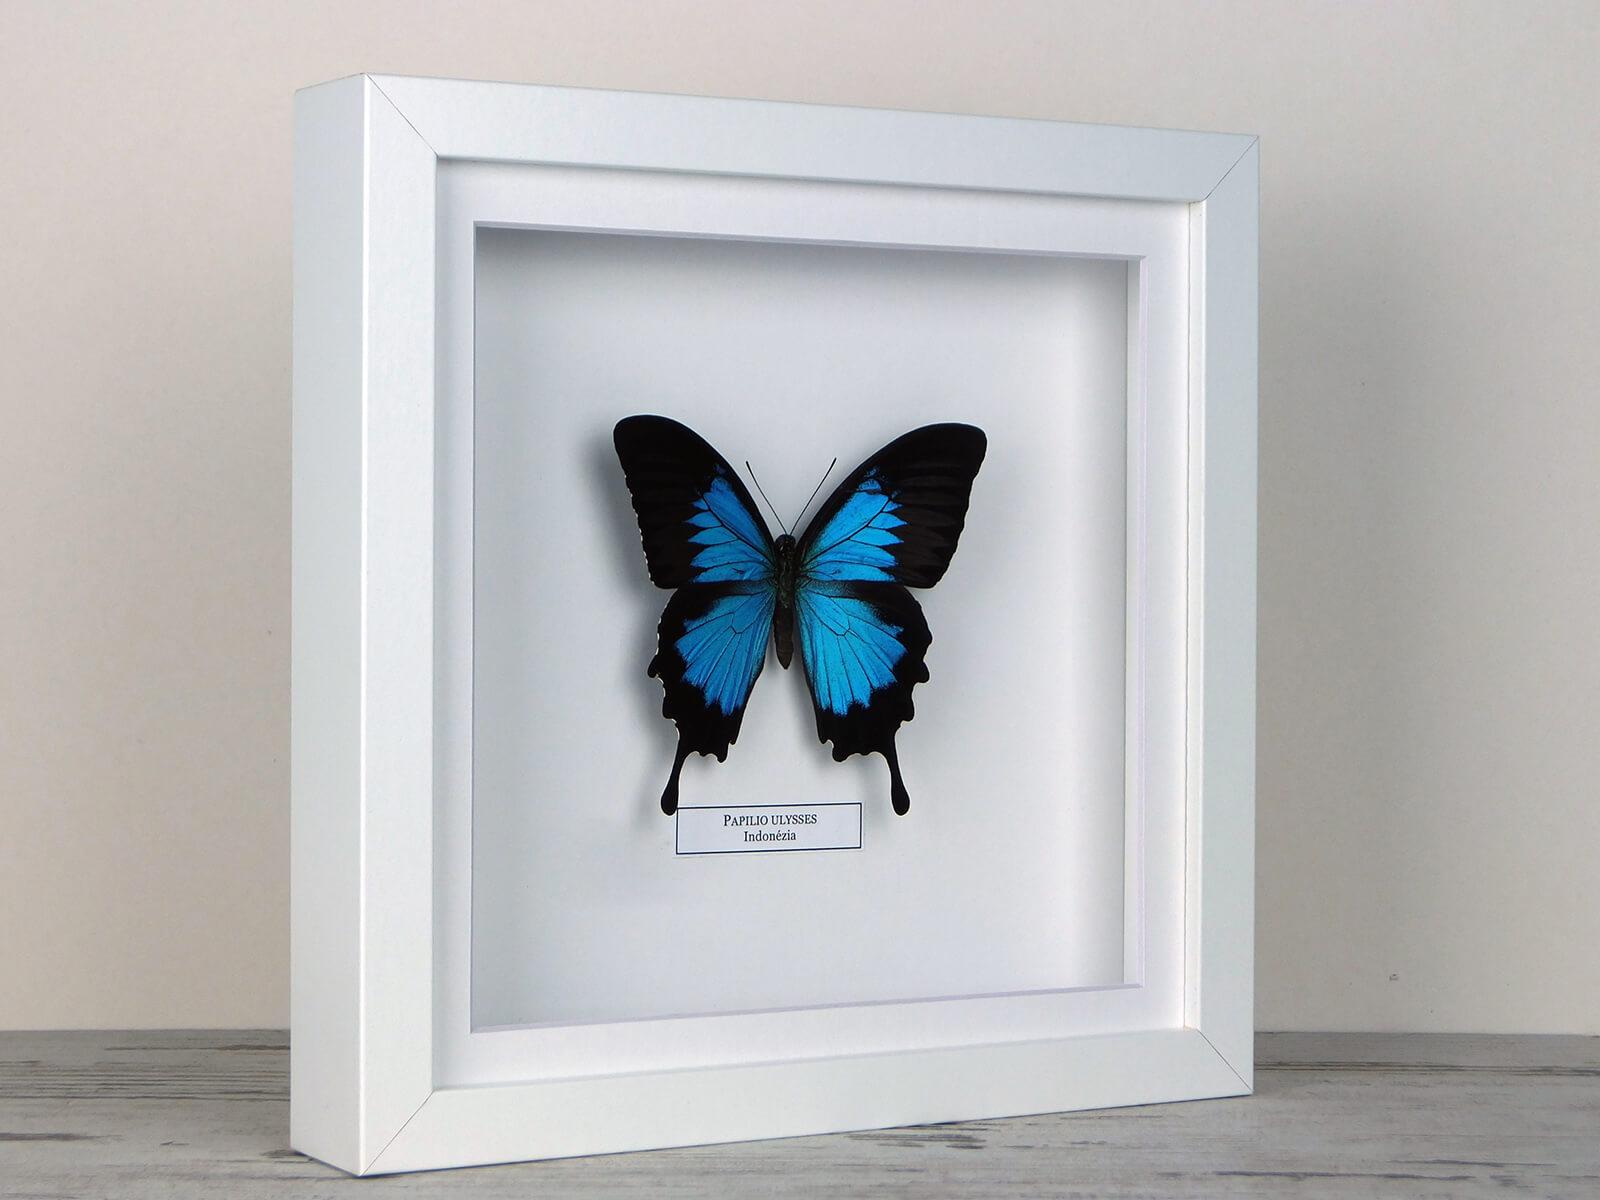 Papilio ulysses, fehér keretben